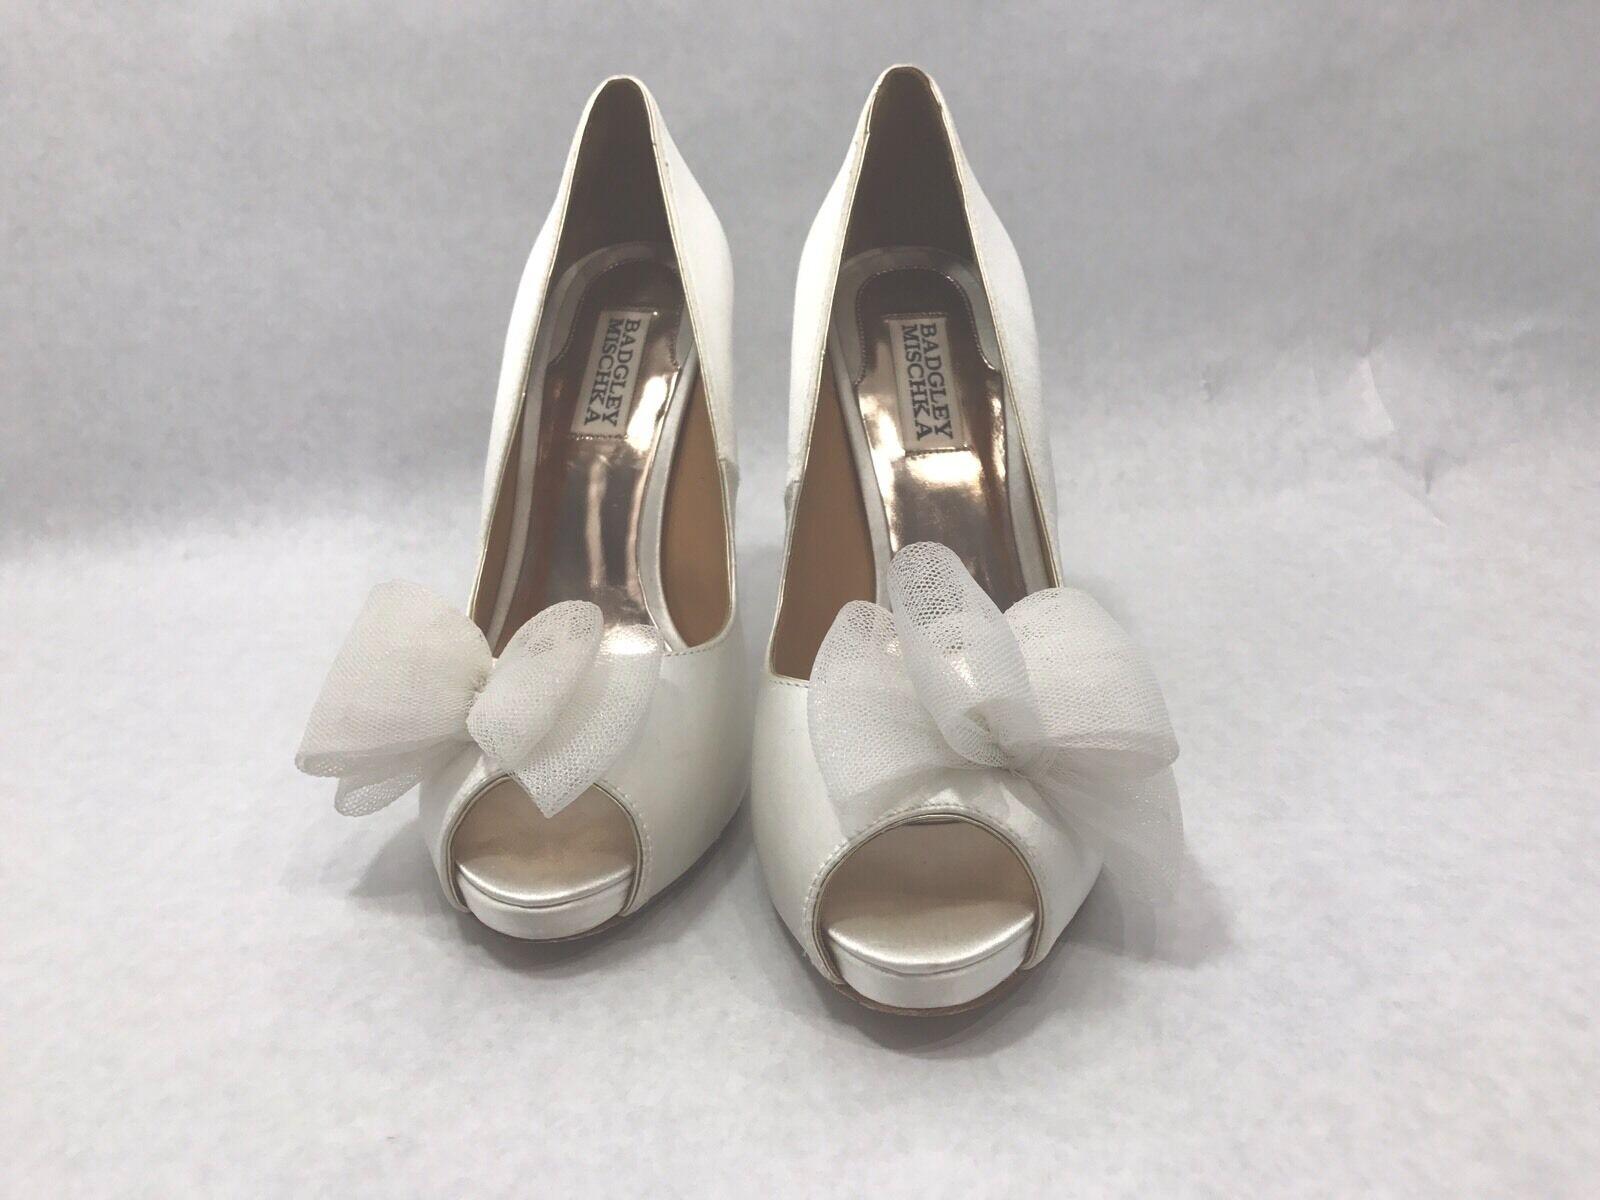 Badgley Mischka Satin Wedding Shoes  Ivory Bow Peep Size Toe Size Peep 8M 0a5451